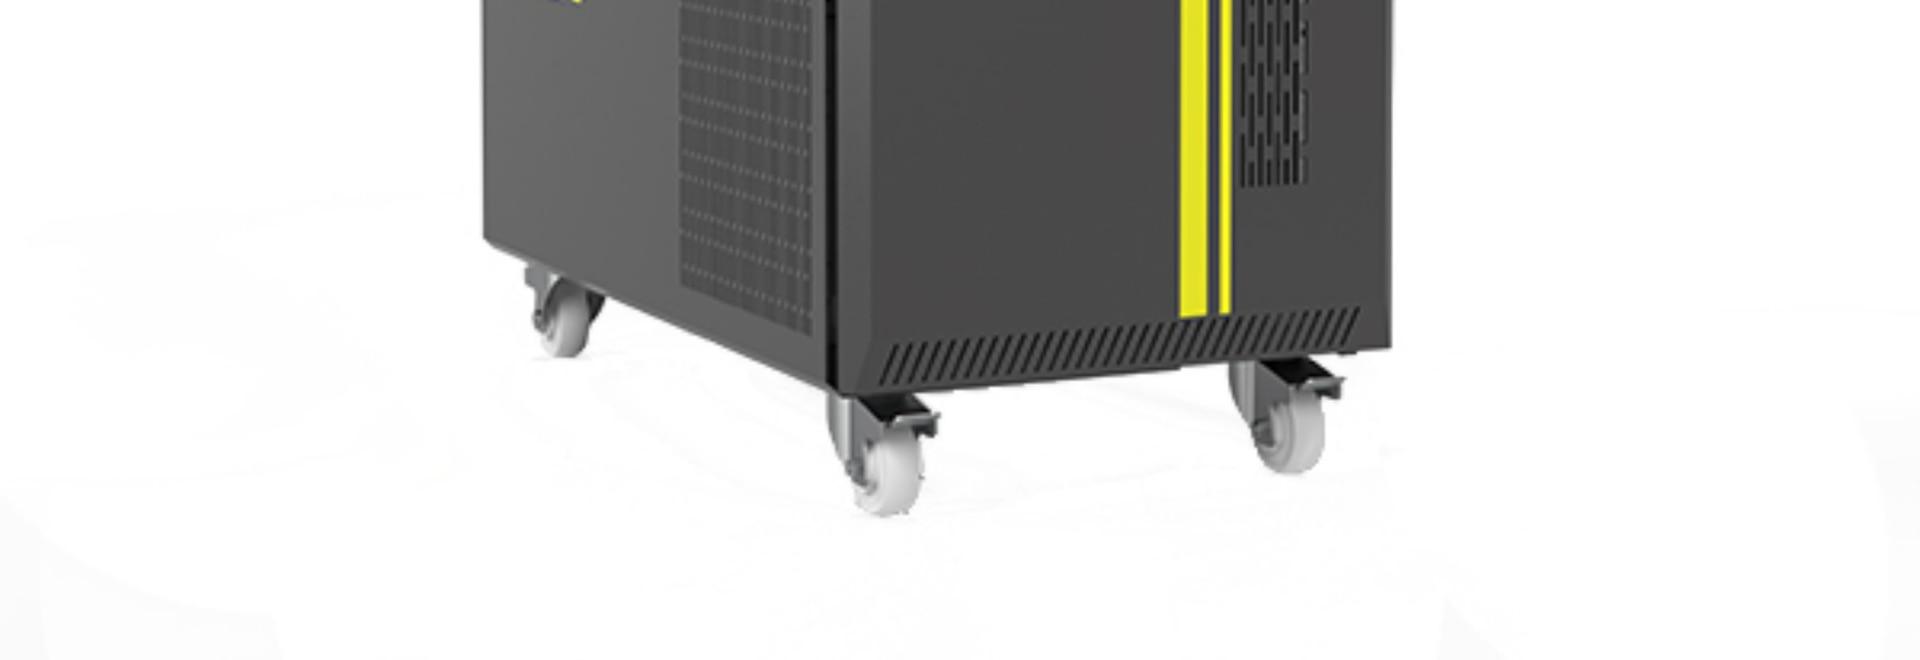 LEIMING New Product Launches- Handheld Laser Welding Machine